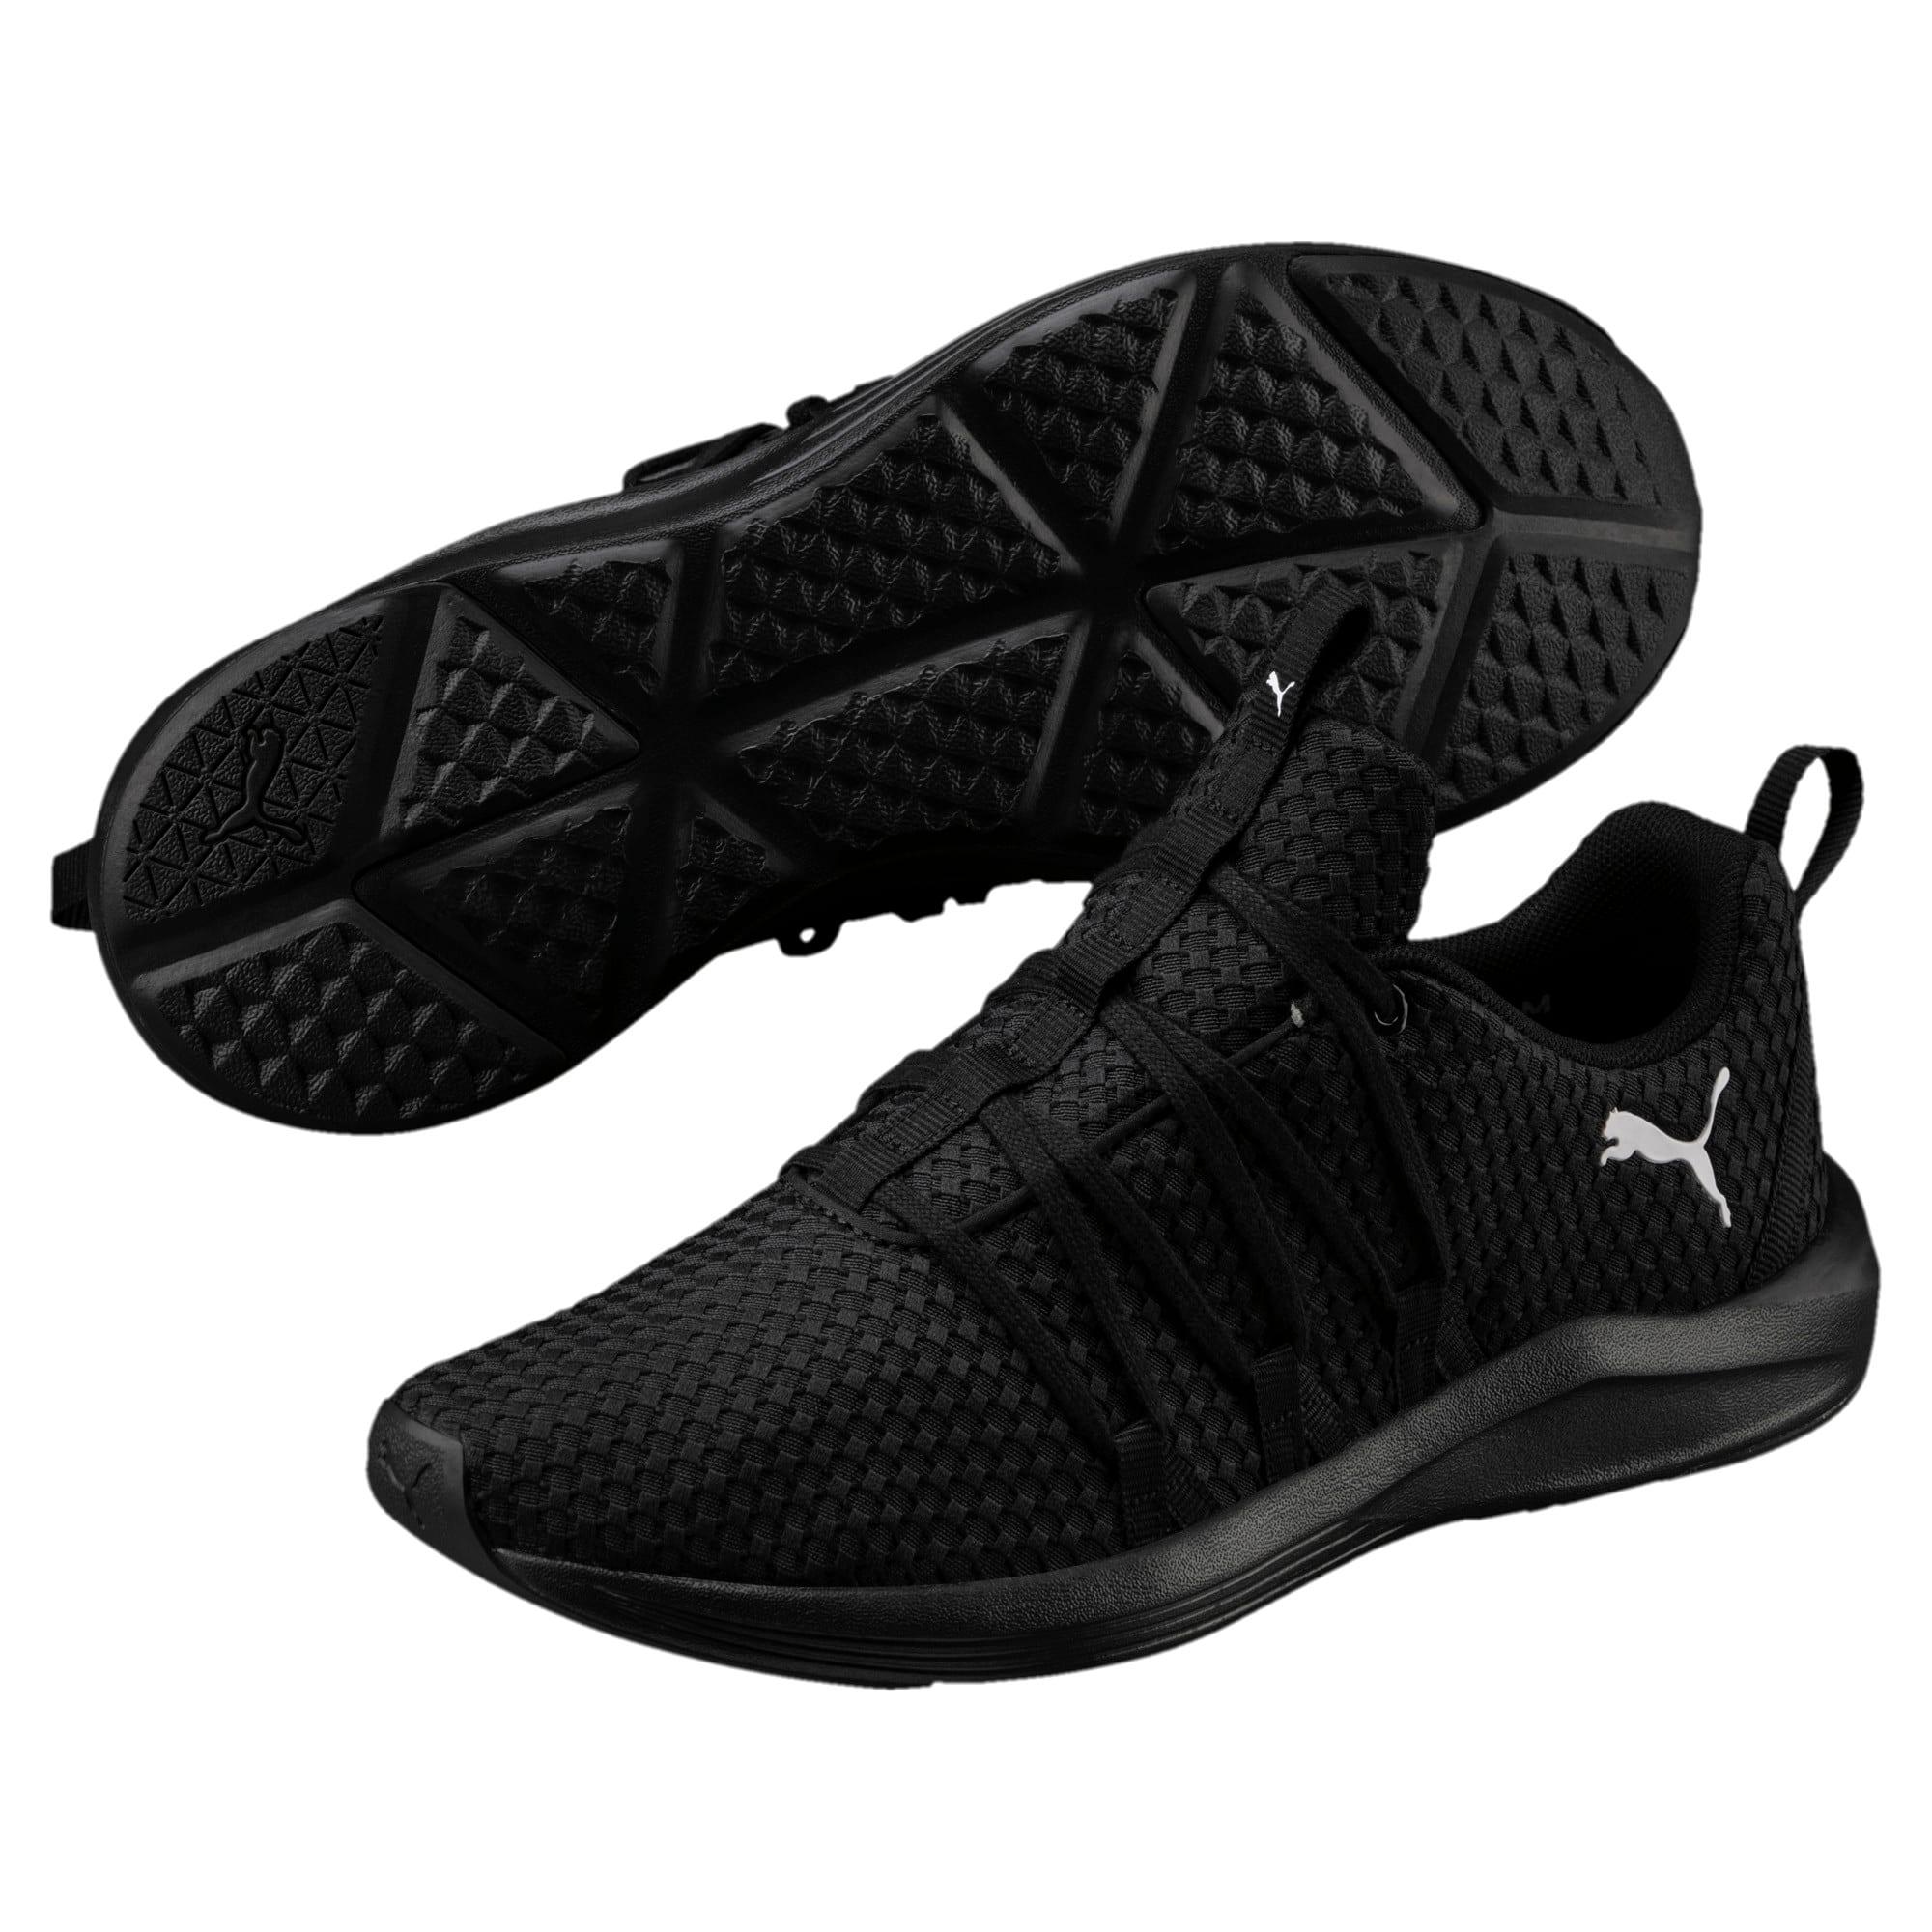 Thumbnail 2 of Prowl Alt Weave Women's Training Shoes, Puma Black-Puma Black, medium-IND